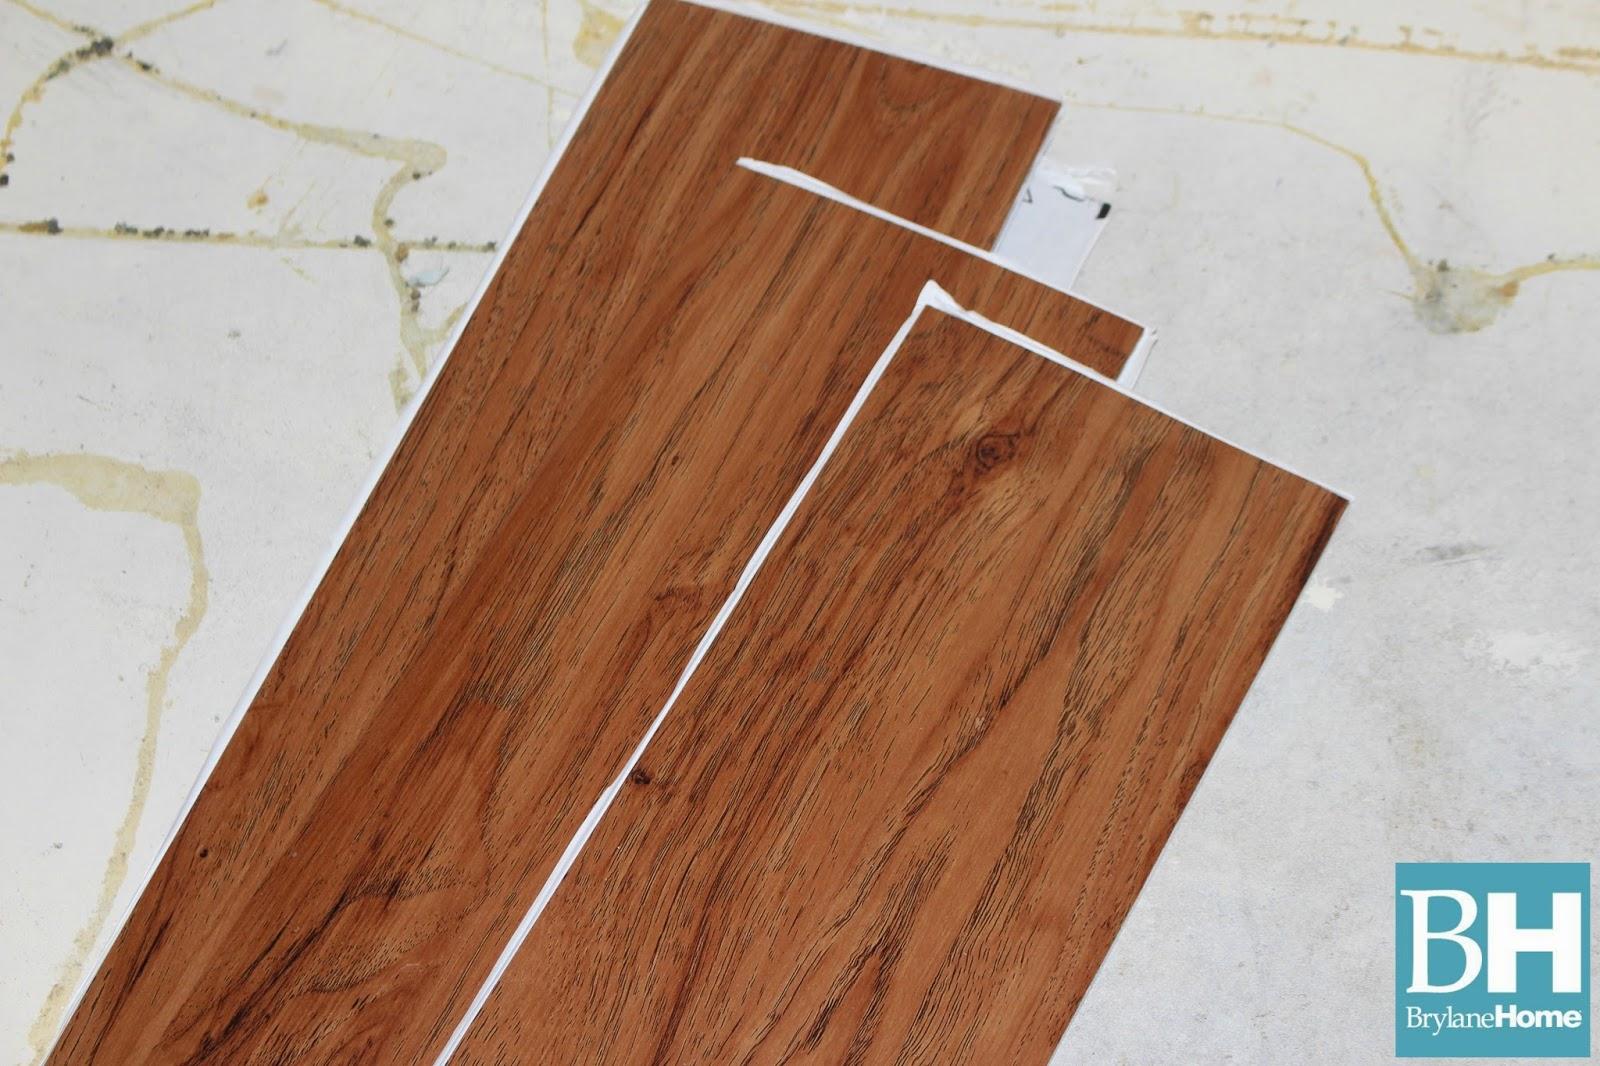 planks glue vinyl county stick pvc floors builddirect collection vesdura flooring pin down commander